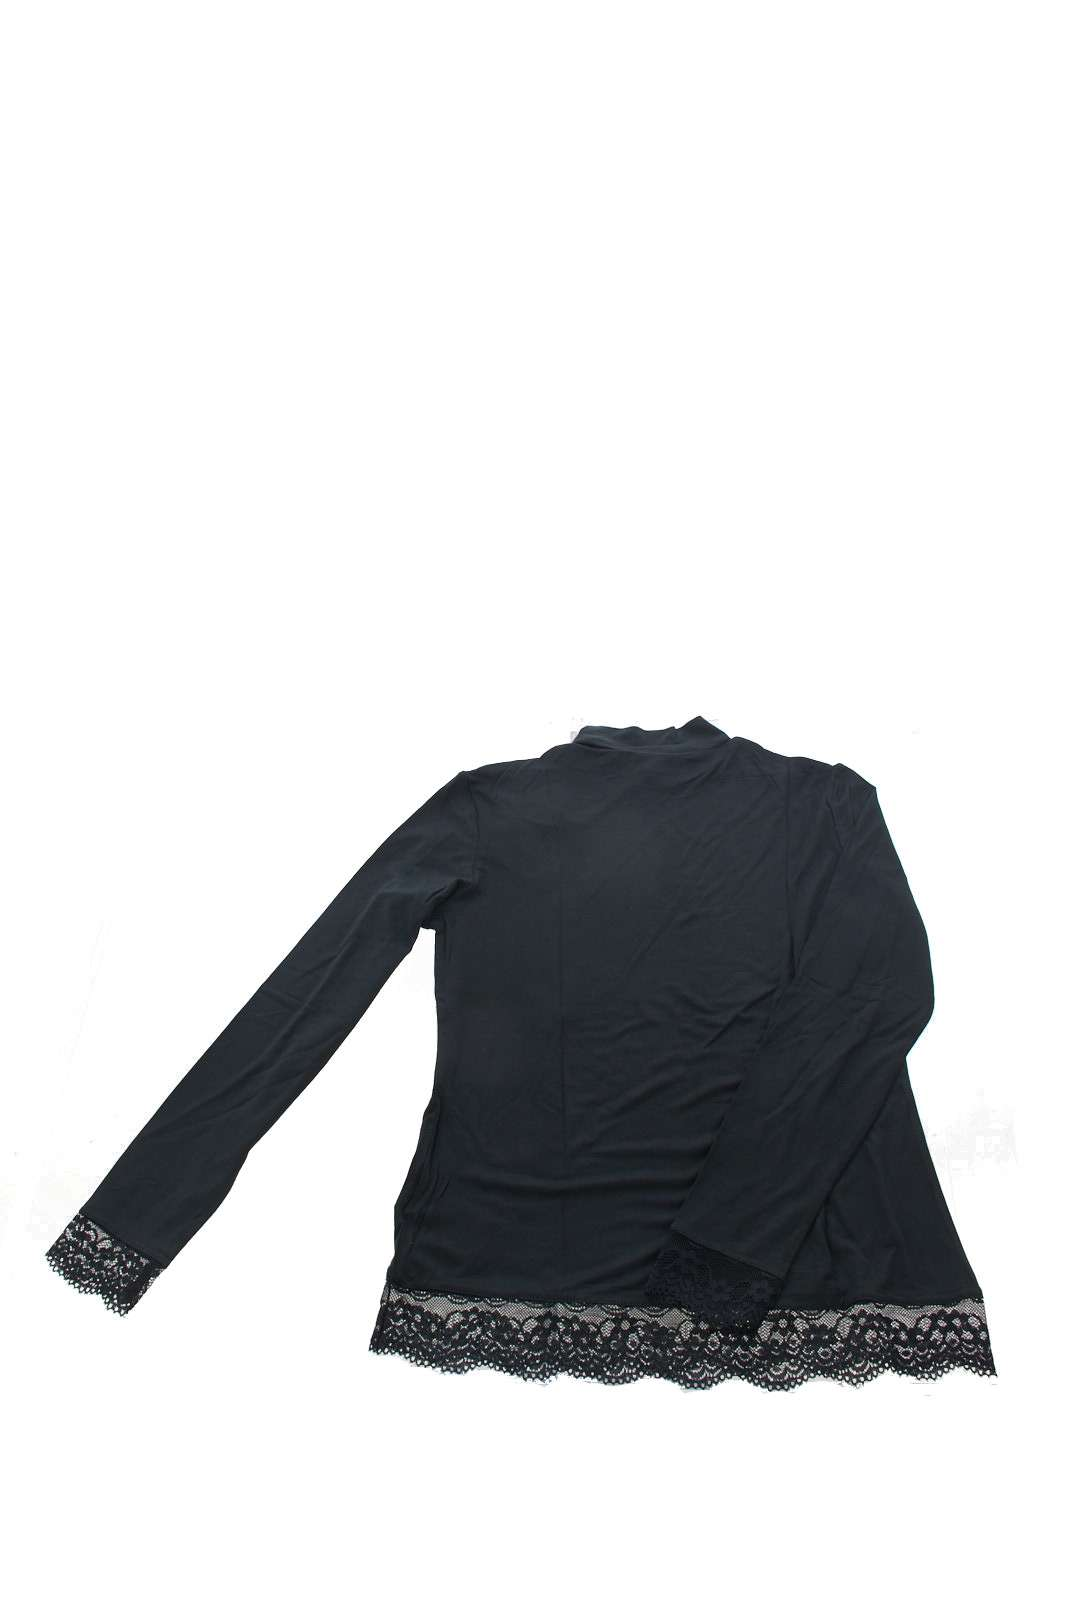 https://www.parmax.com/media/catalog/product/a/i/AI-outlet_parmax-maglia-bambina-Silvia%20Heach-mdji5010lu-B.jpg